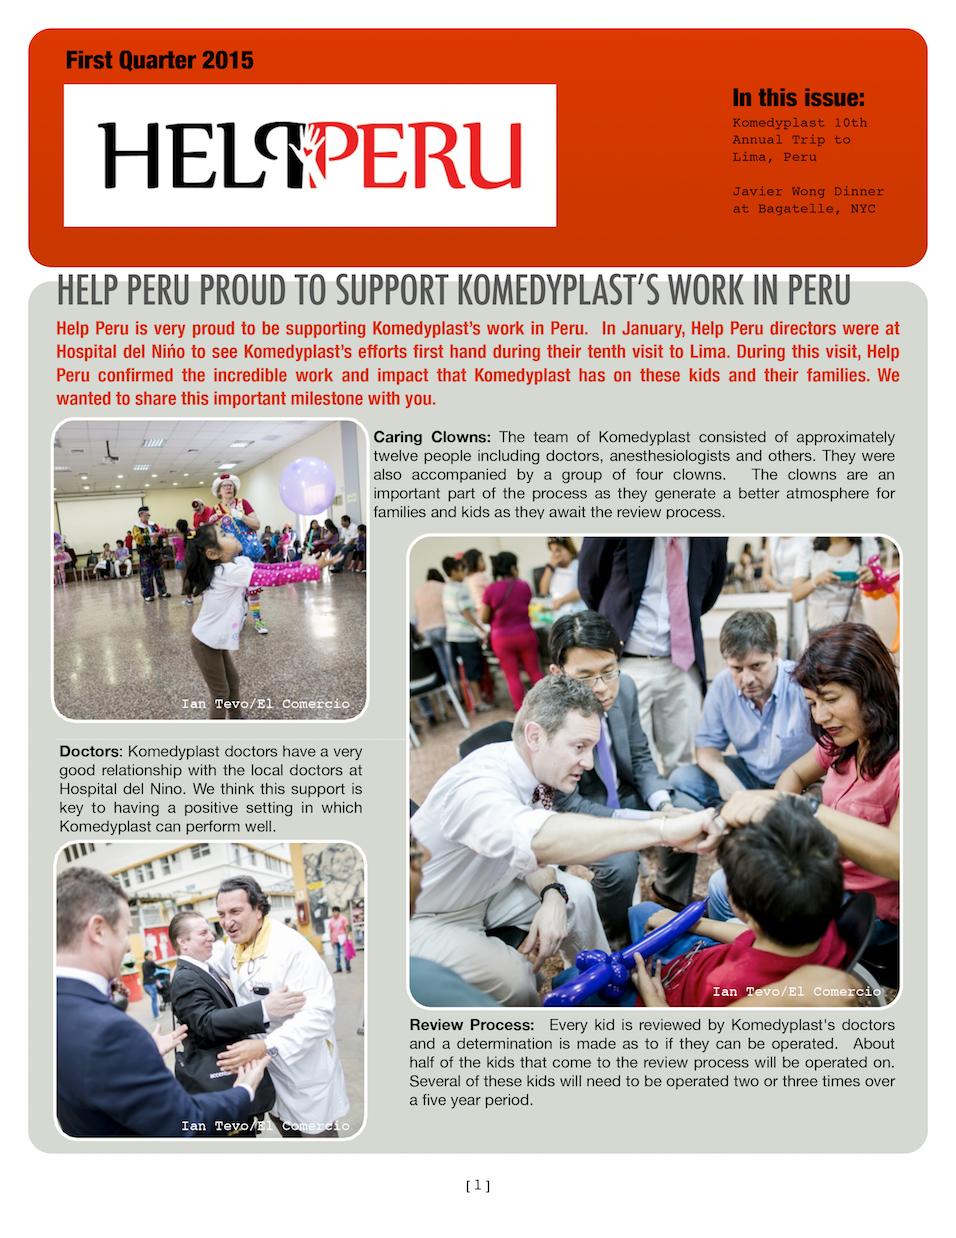 Help Peru Bulletin 1Q 2015